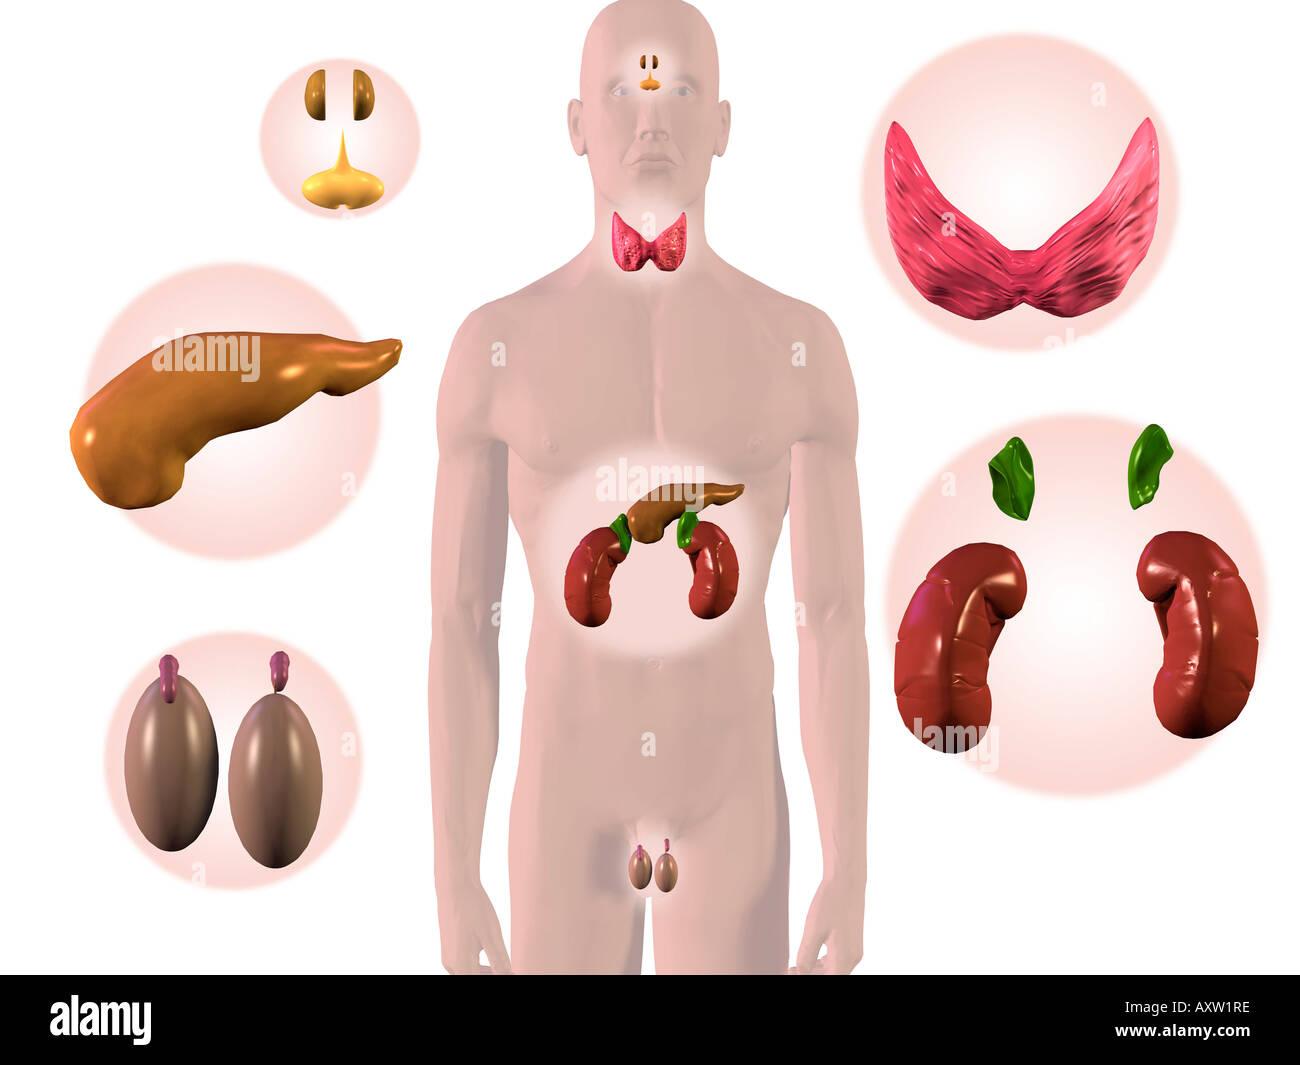 Männliche Hormonsystem Stockfoto, Bild: 9668157 - Alamy